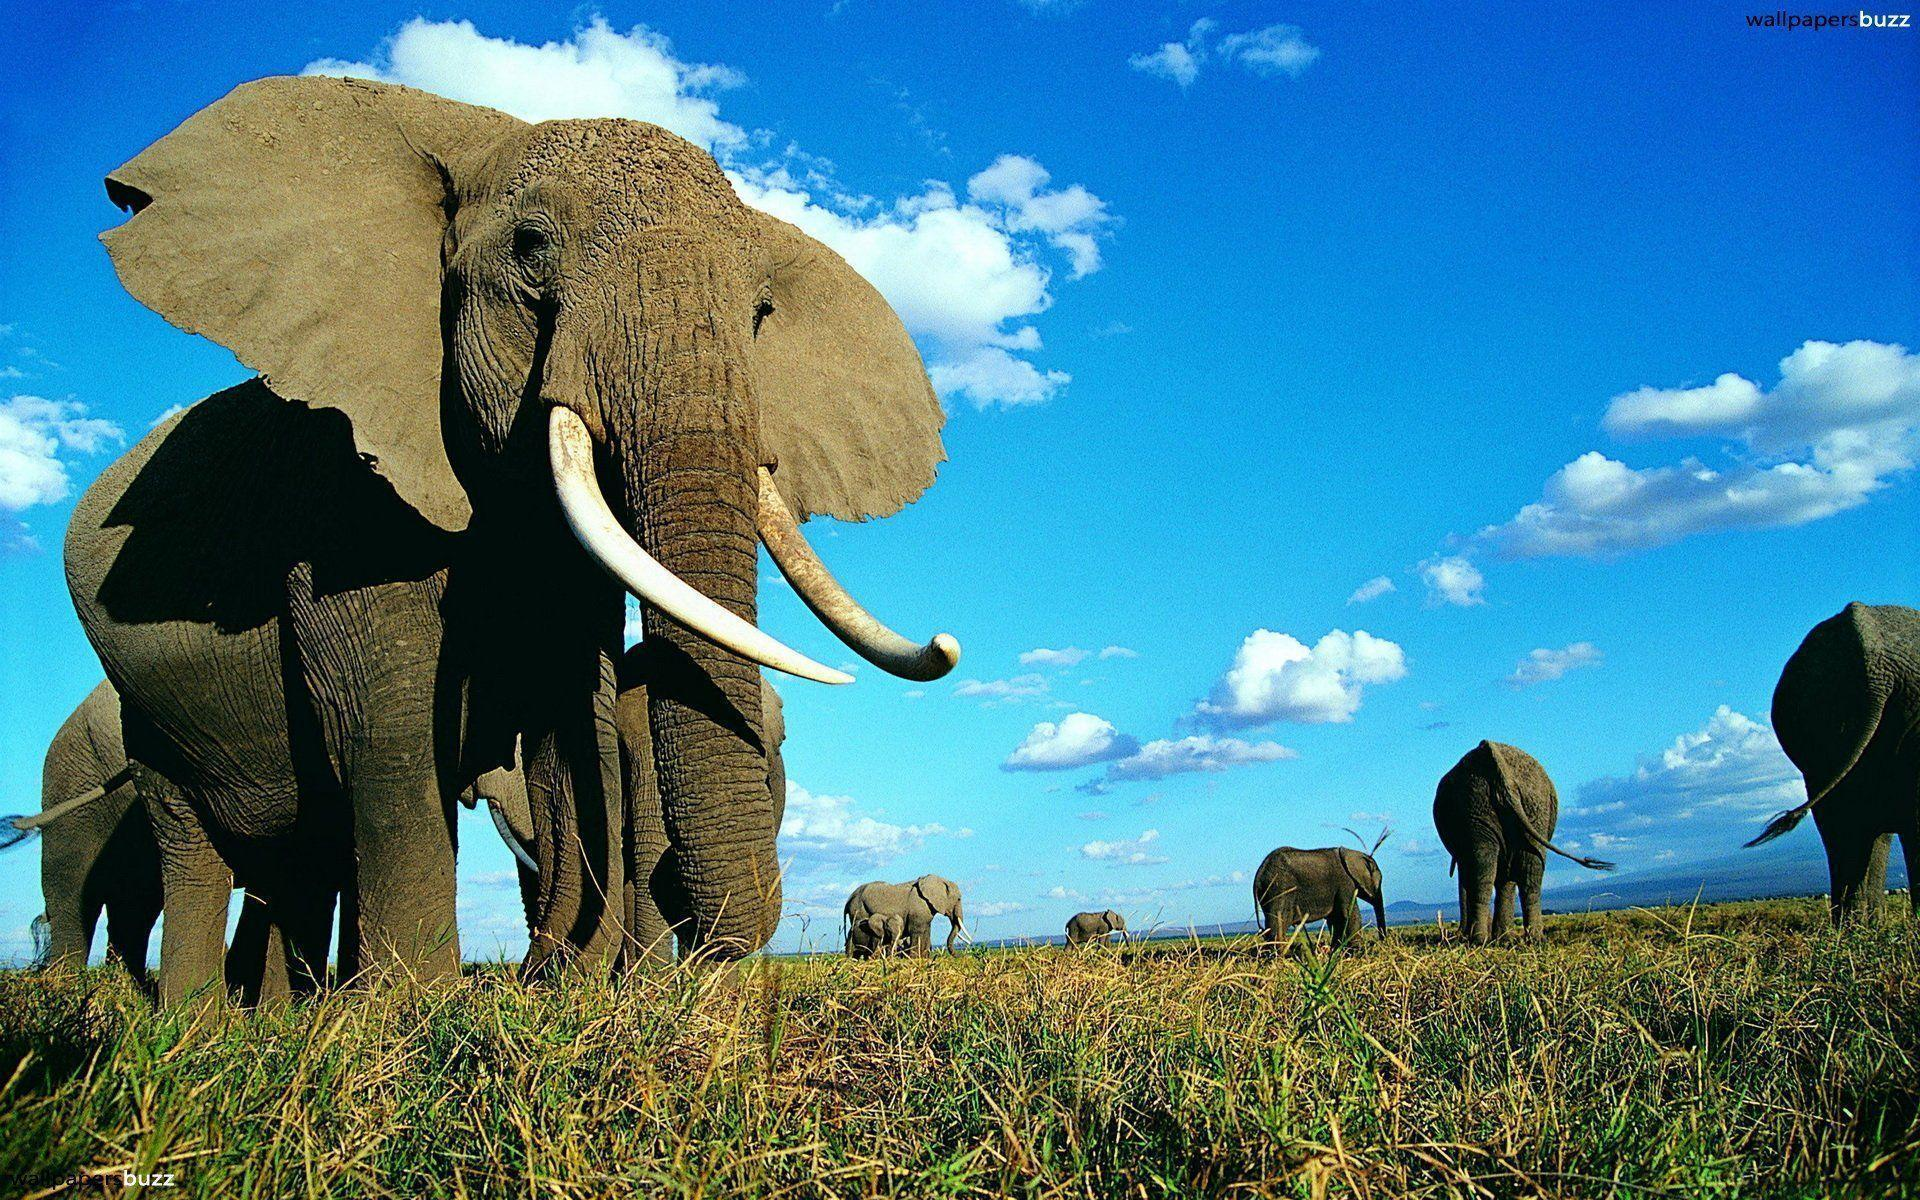 Elephant Wallapaper hd (7) - Wallpapers Online | Amazing ...